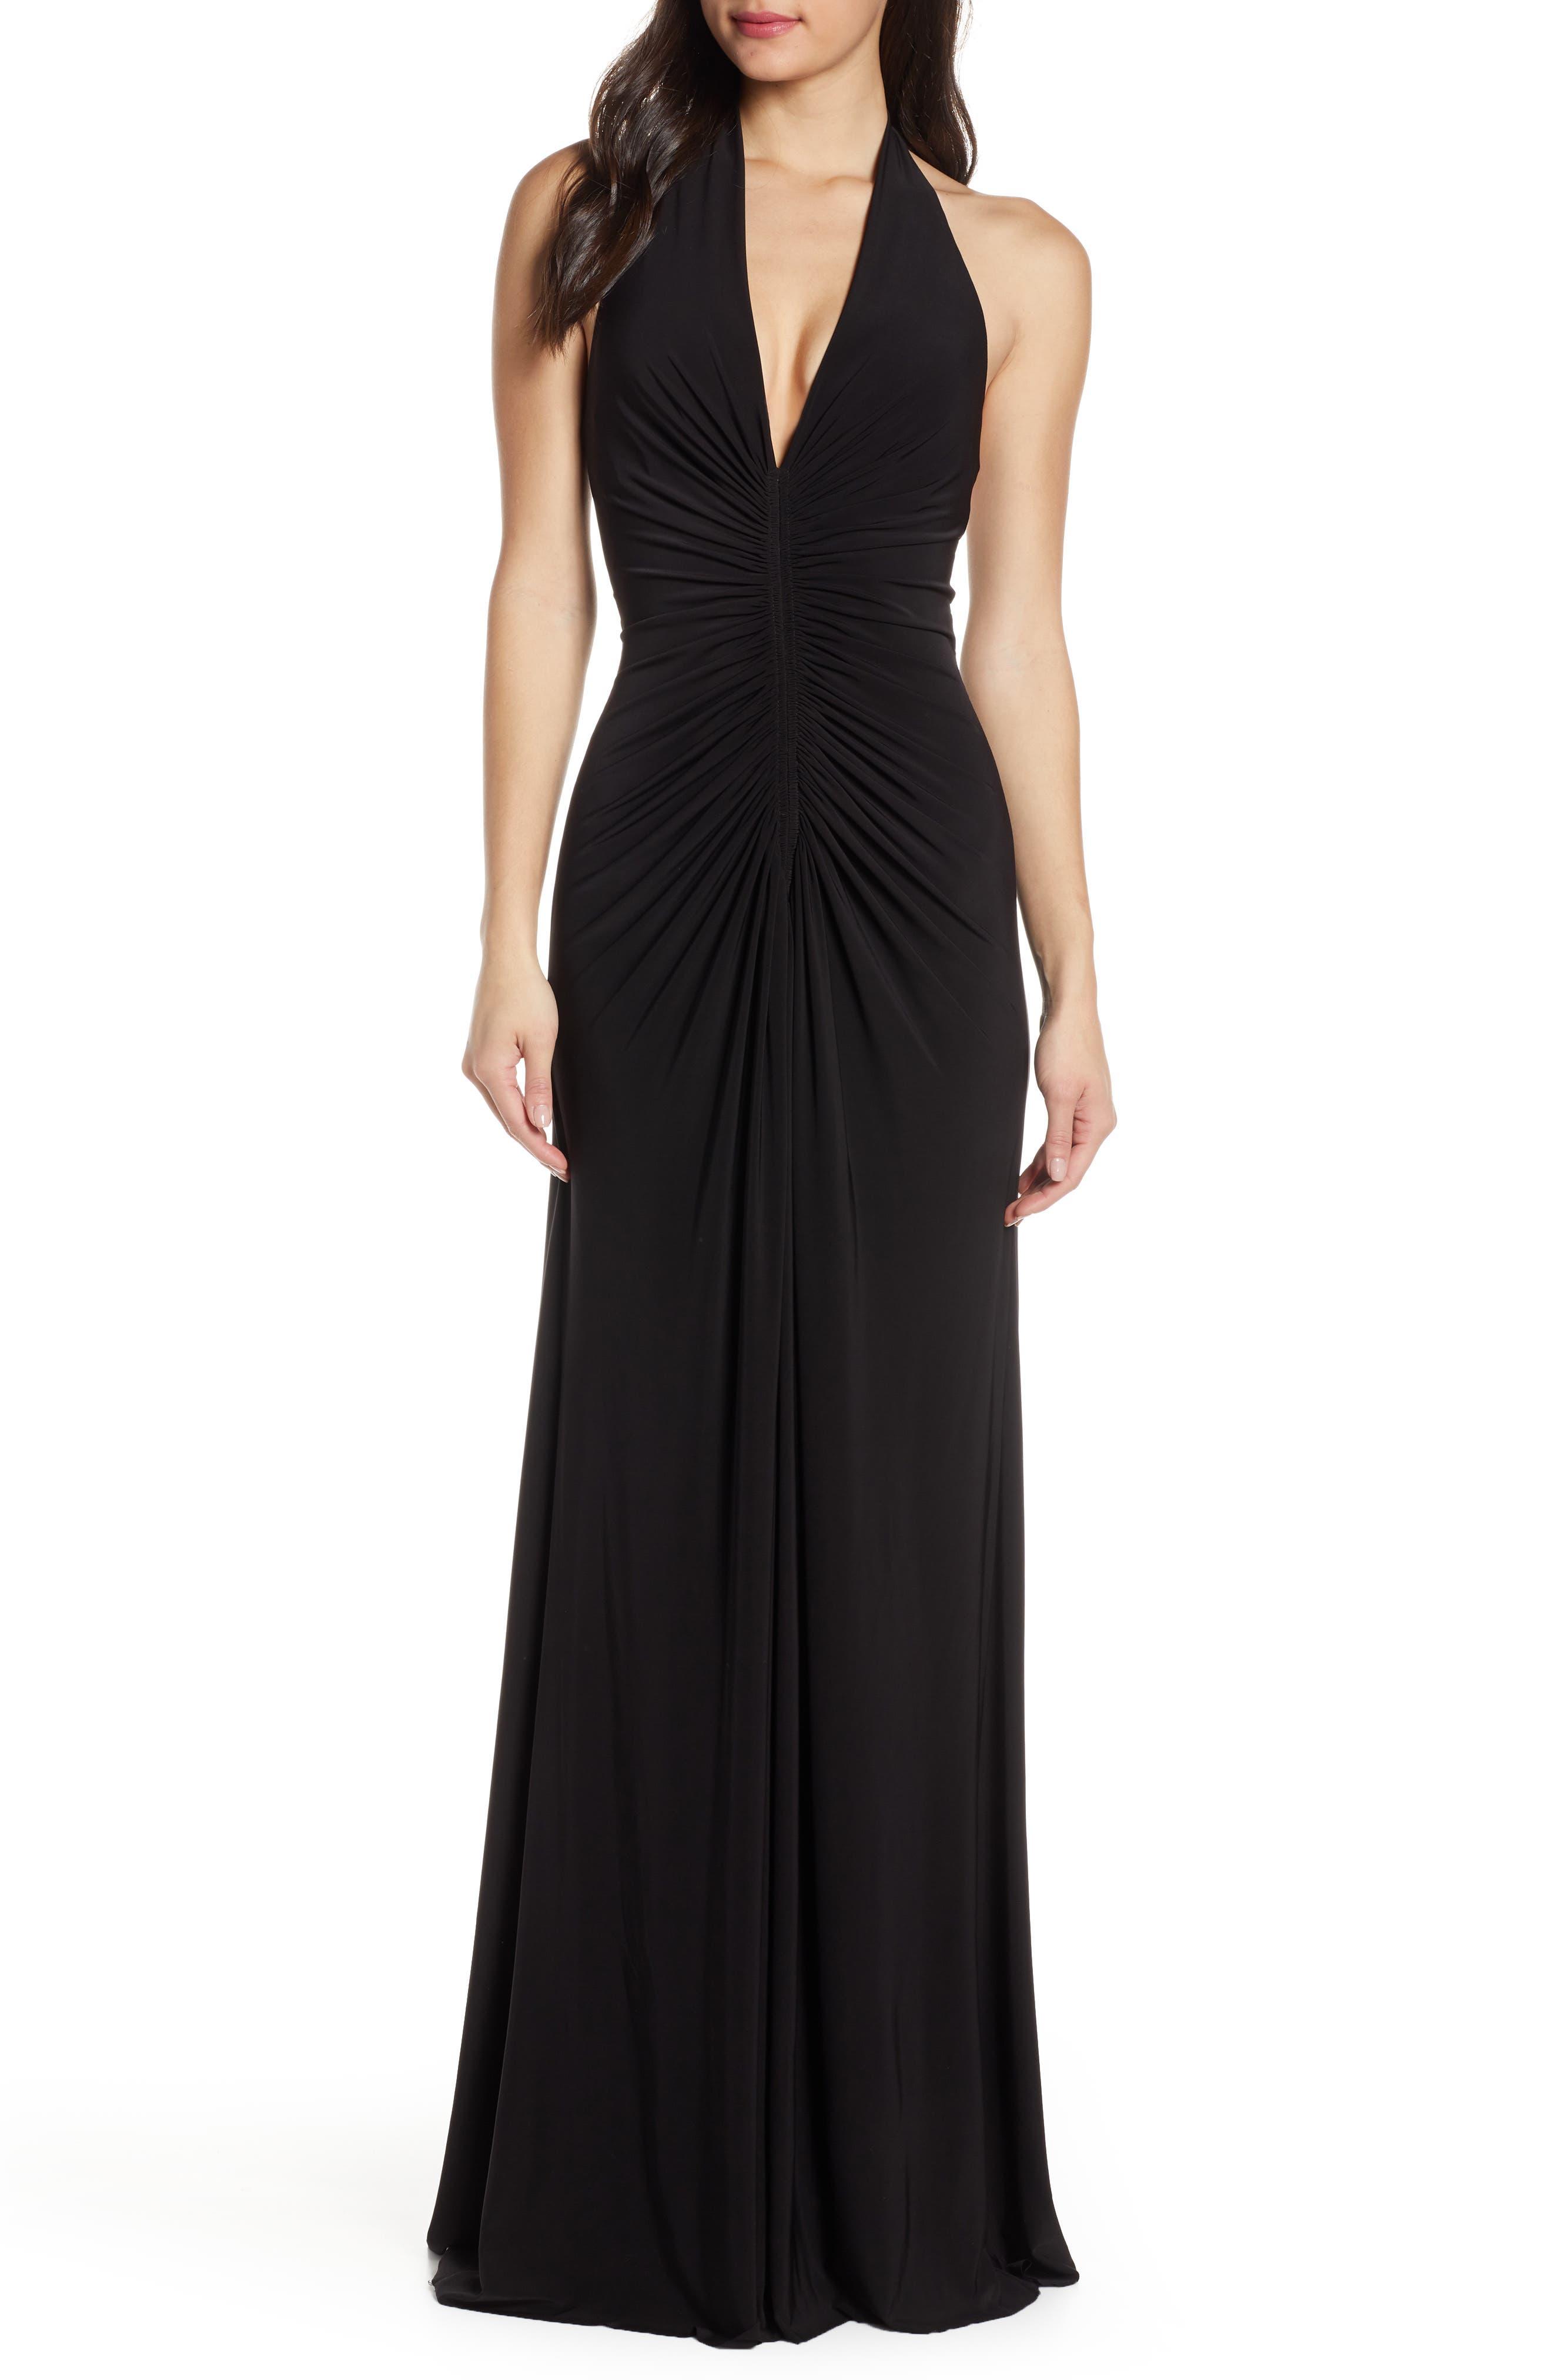 Jill Jill Stuart Jersey Halter Gown, Black